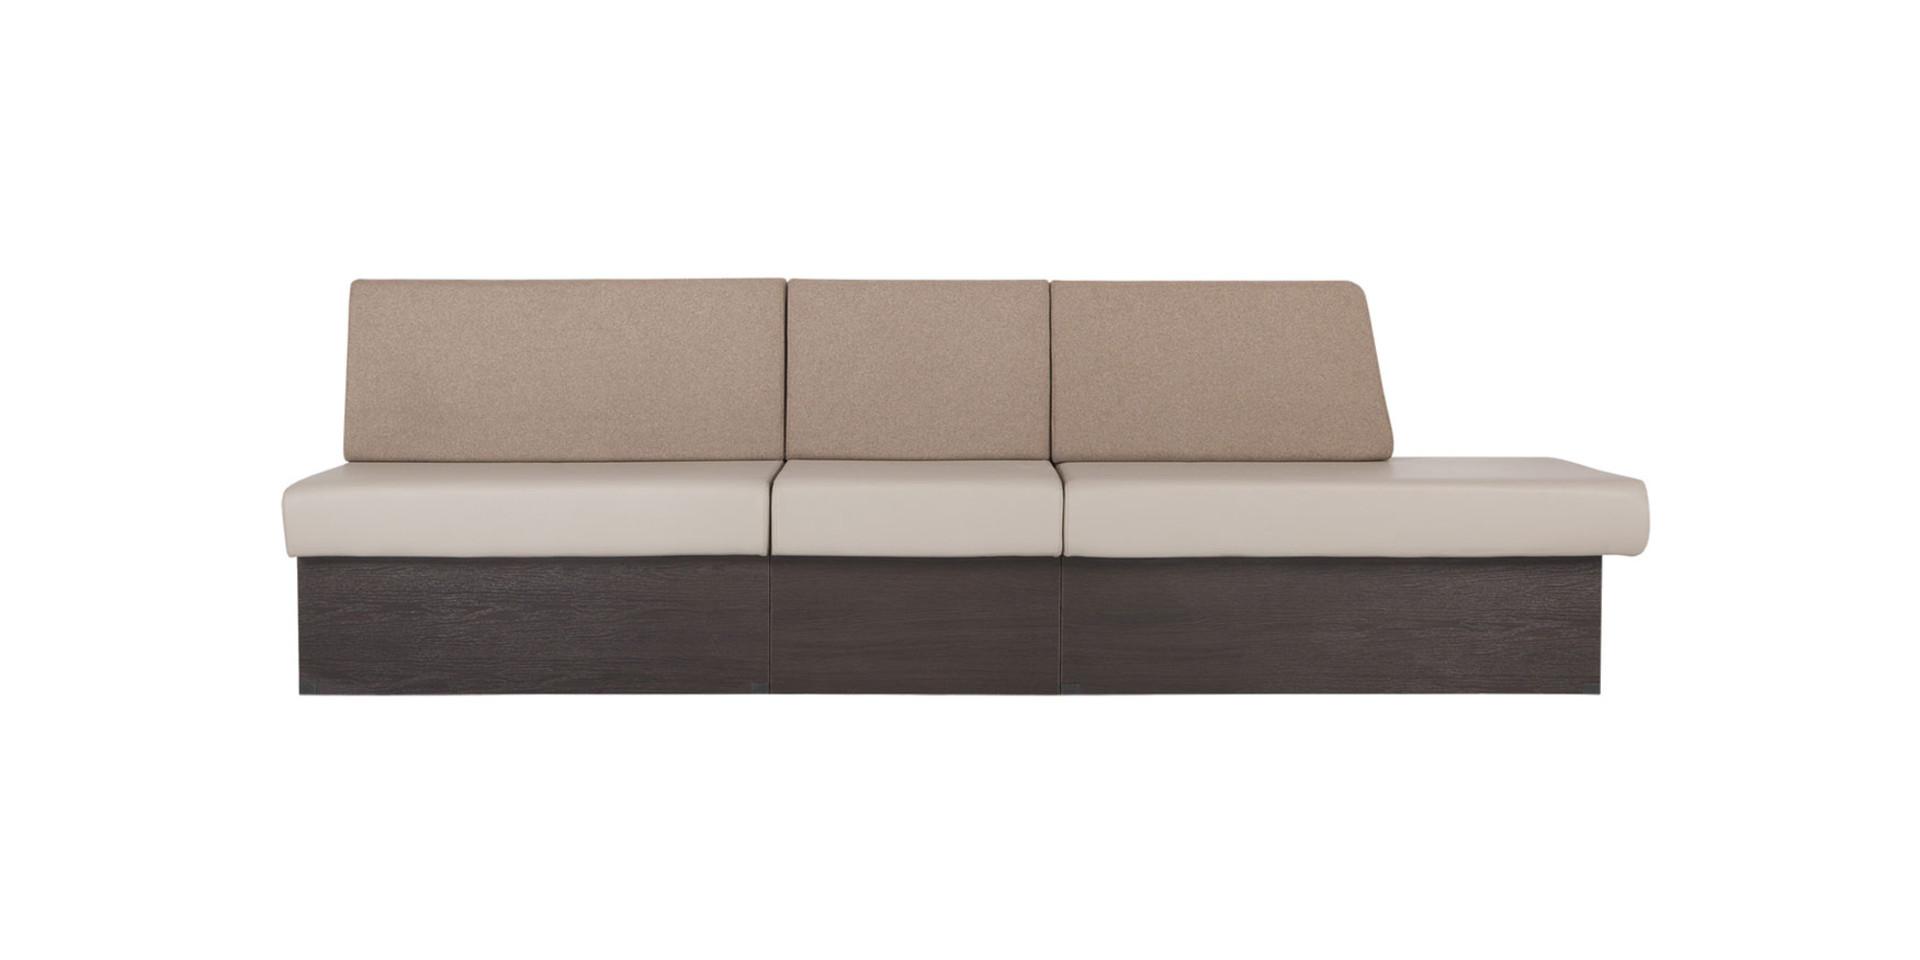 sits-hedda-angle-elements_panno1026_light_brown_sixty13_sahara_1